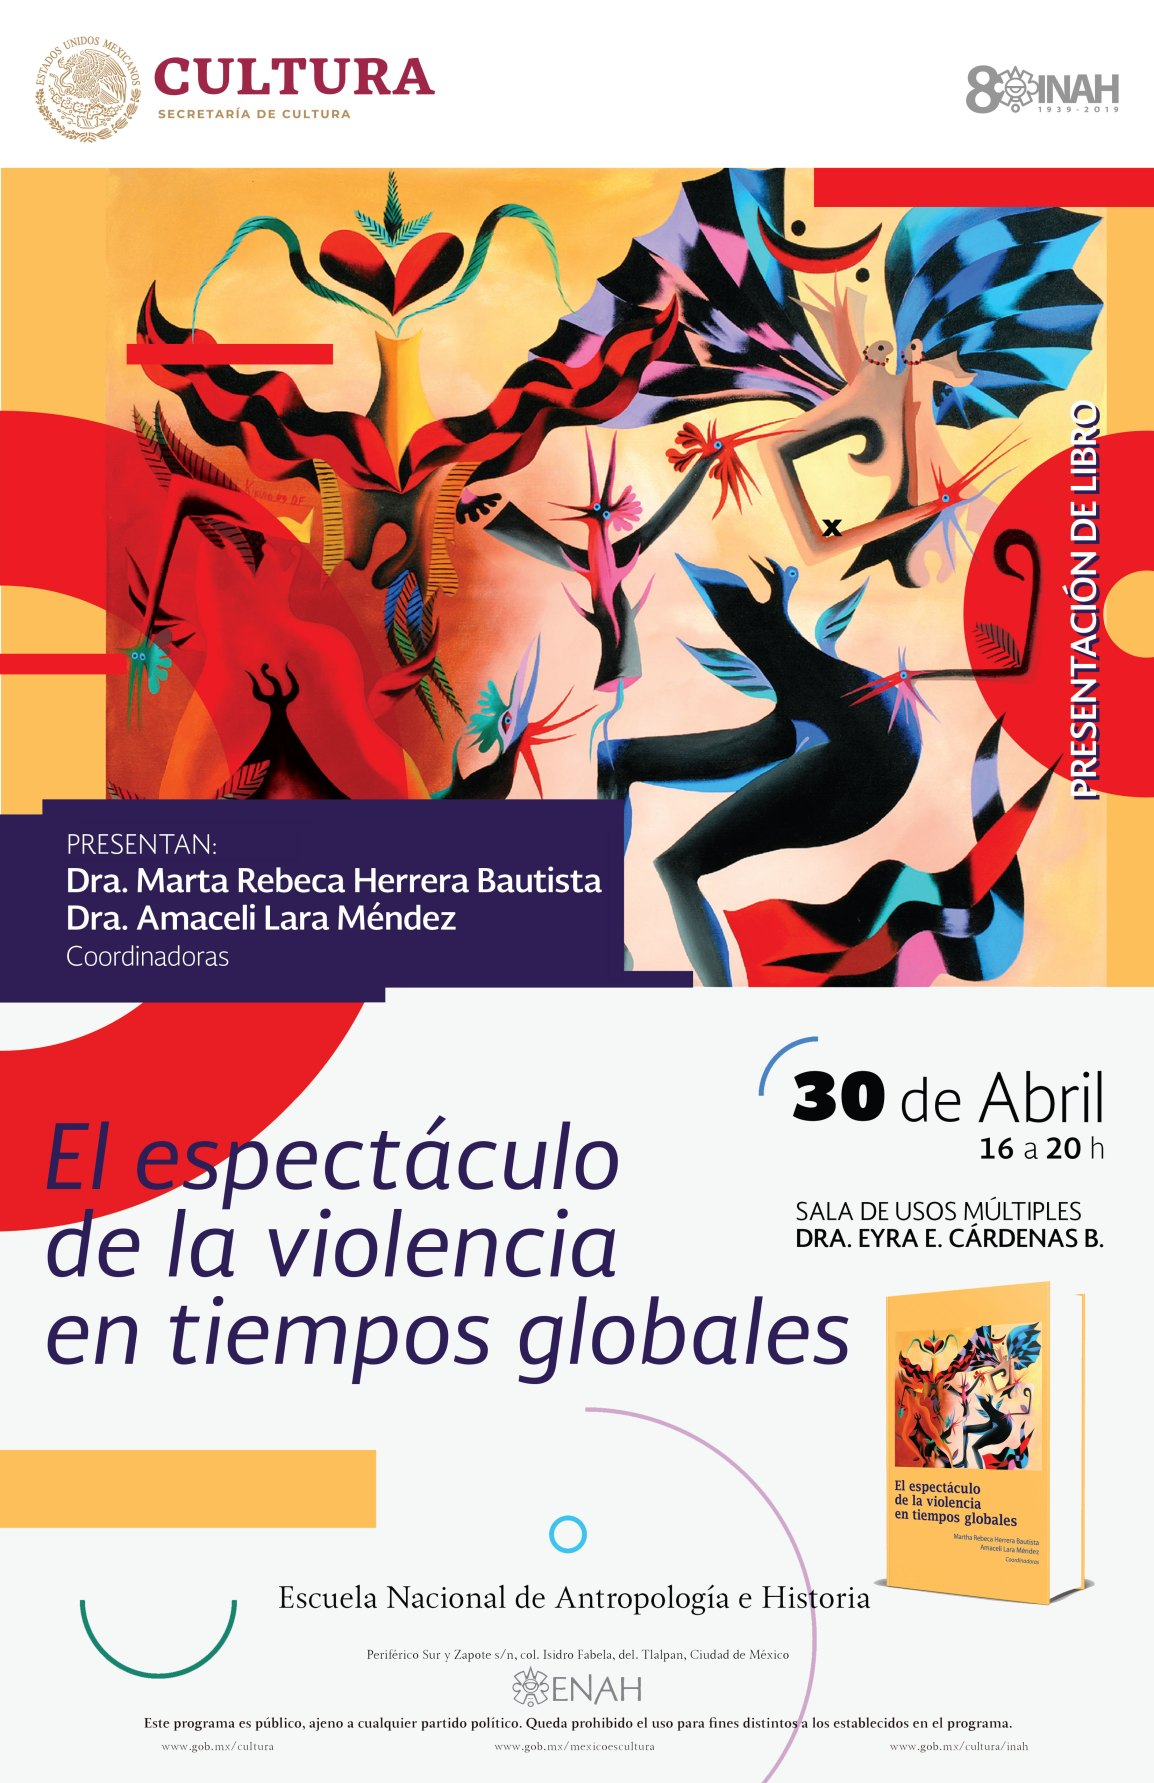 https://i1.wp.com/www.enah.edu.mx/images/2019/difusion_cultura/violencia_tiempos_globales/violencia-en-tiempos-globales.jpg?w=1154&ssl=1